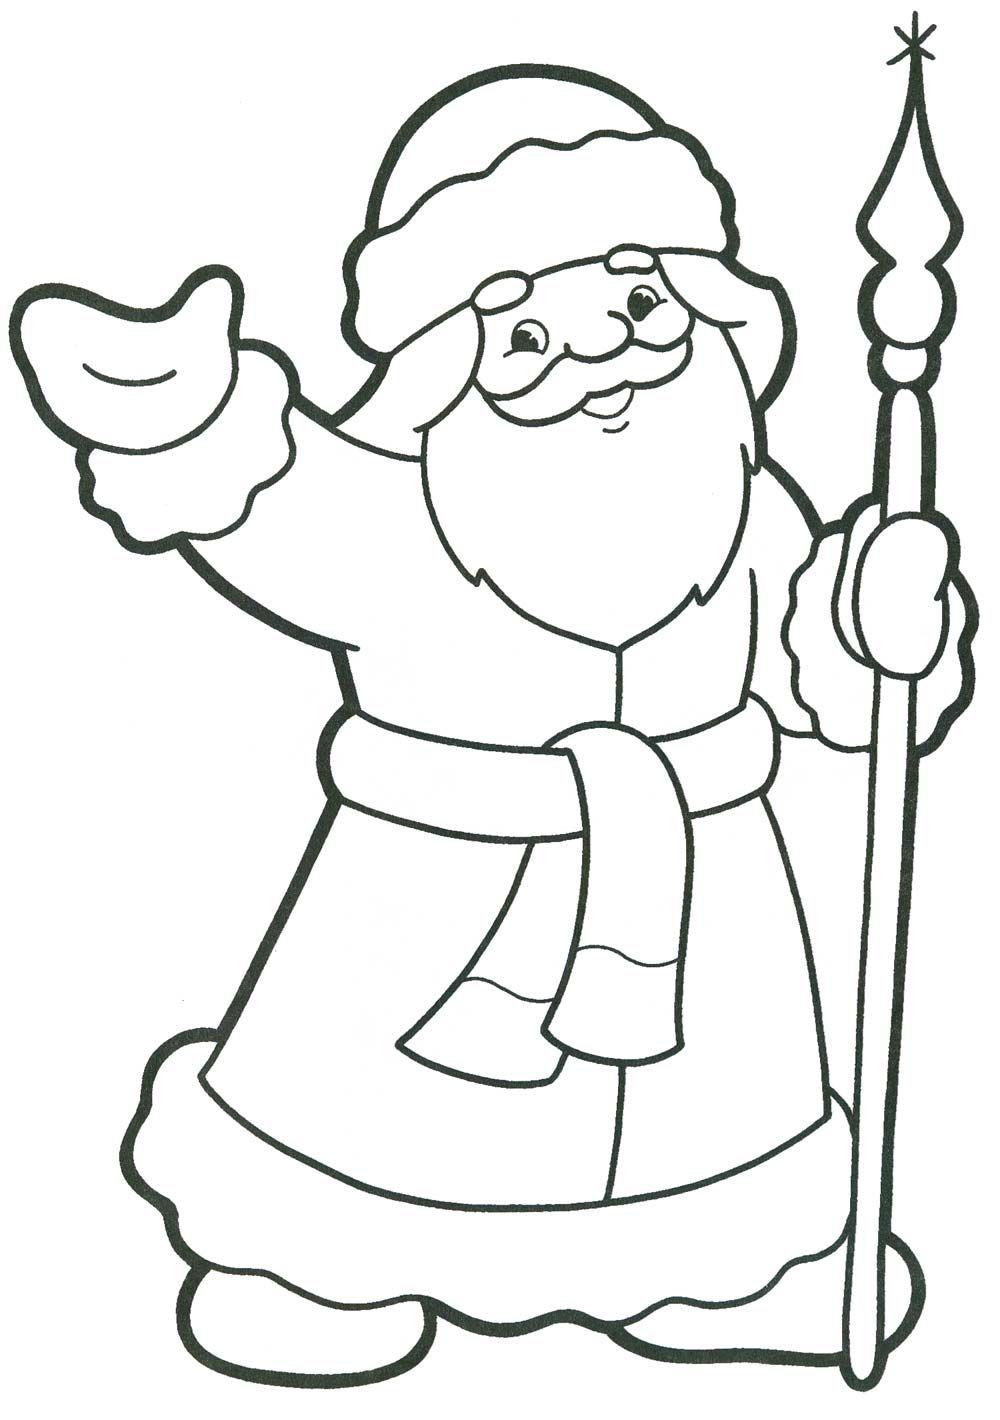 Раскраска. Дед Мороз | Рождественские раскраски, Раскраски ...